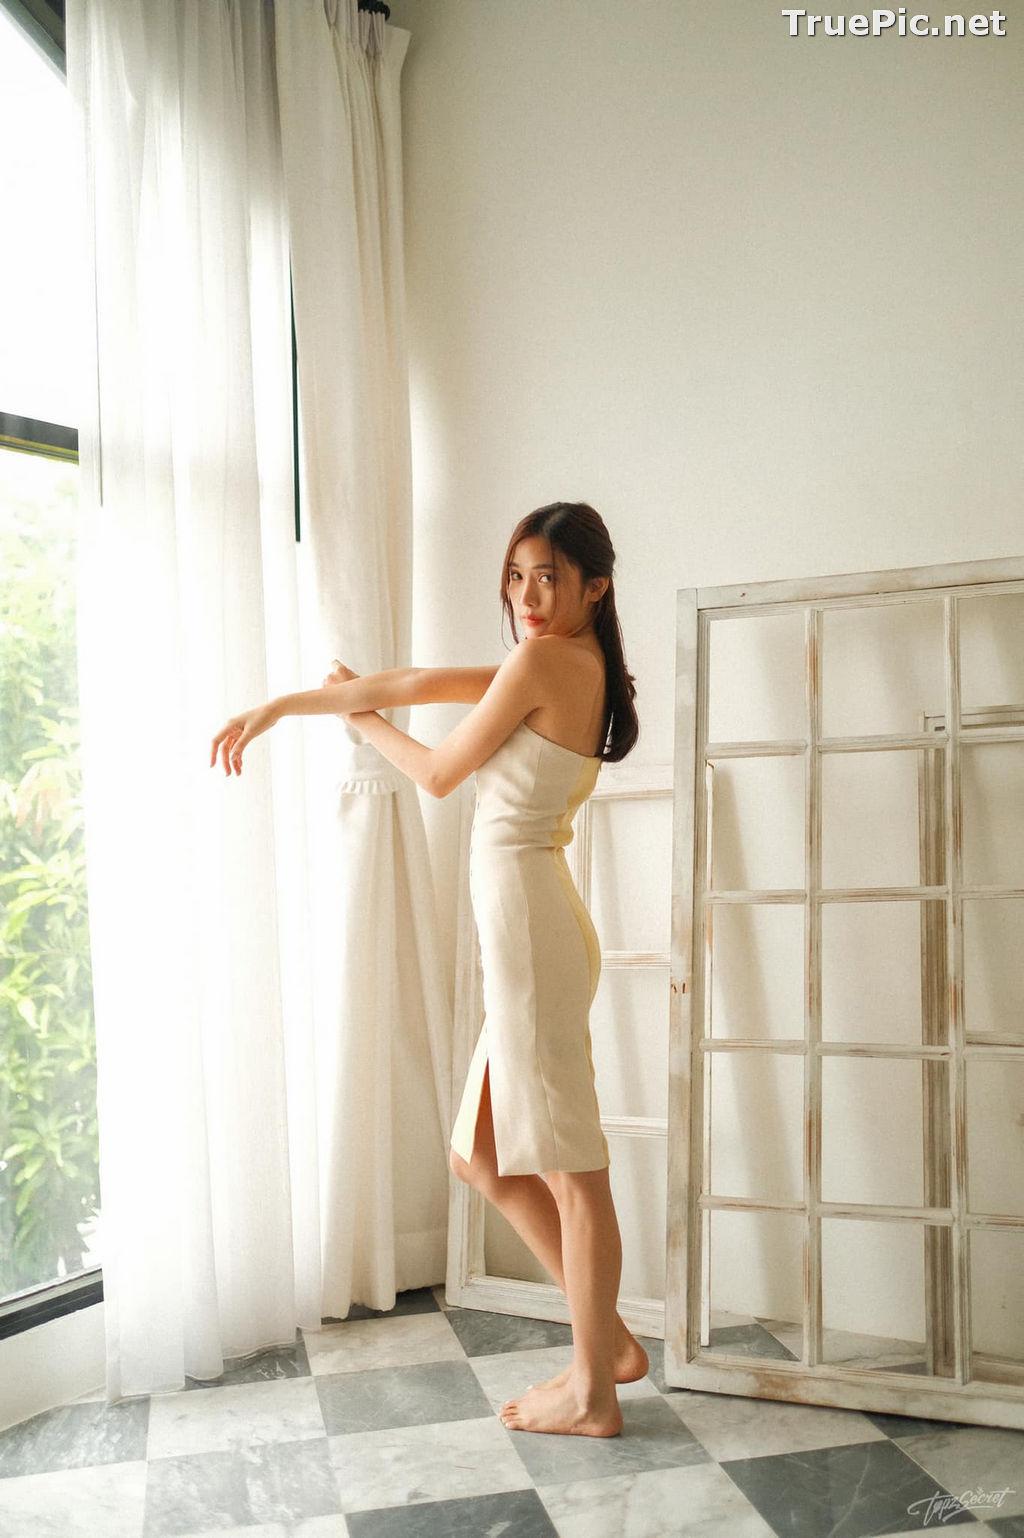 Image Thailand Model - Weeraya Sukaram - Concept Bodycon Dresses - TruePic.net - Picture-8